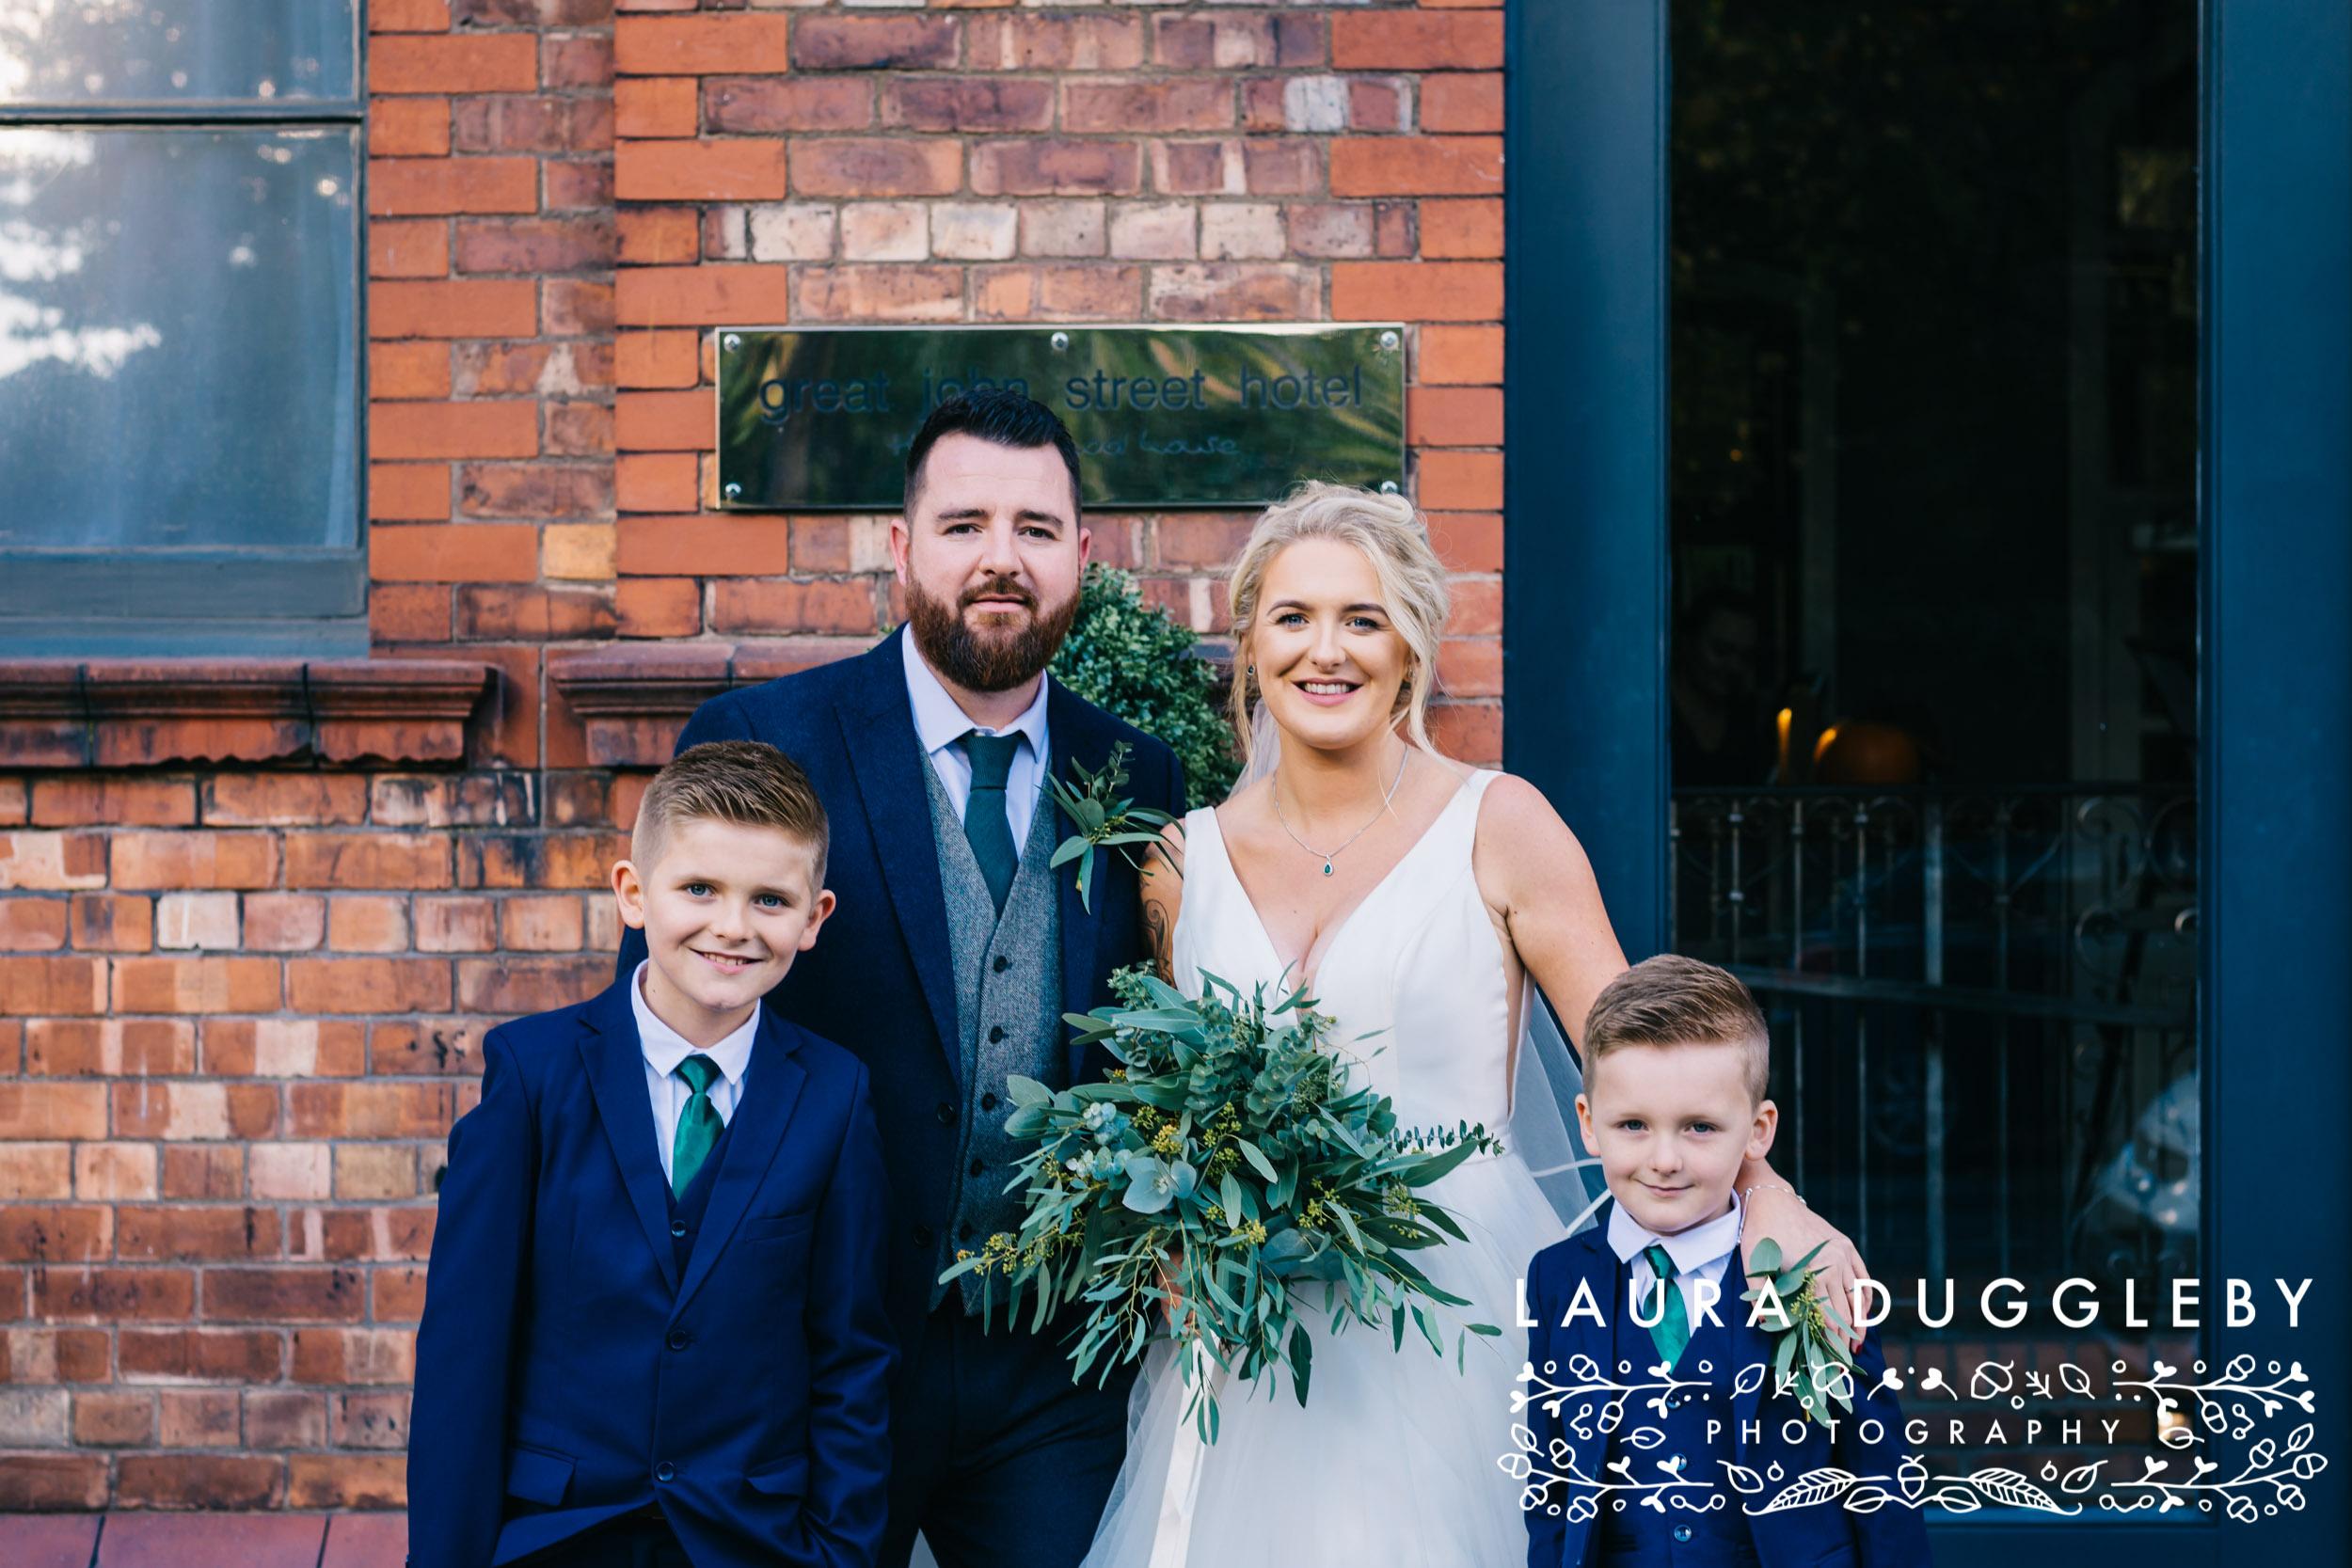 Manchester Wedding Photographer - Wedding At Great John Street Hotel